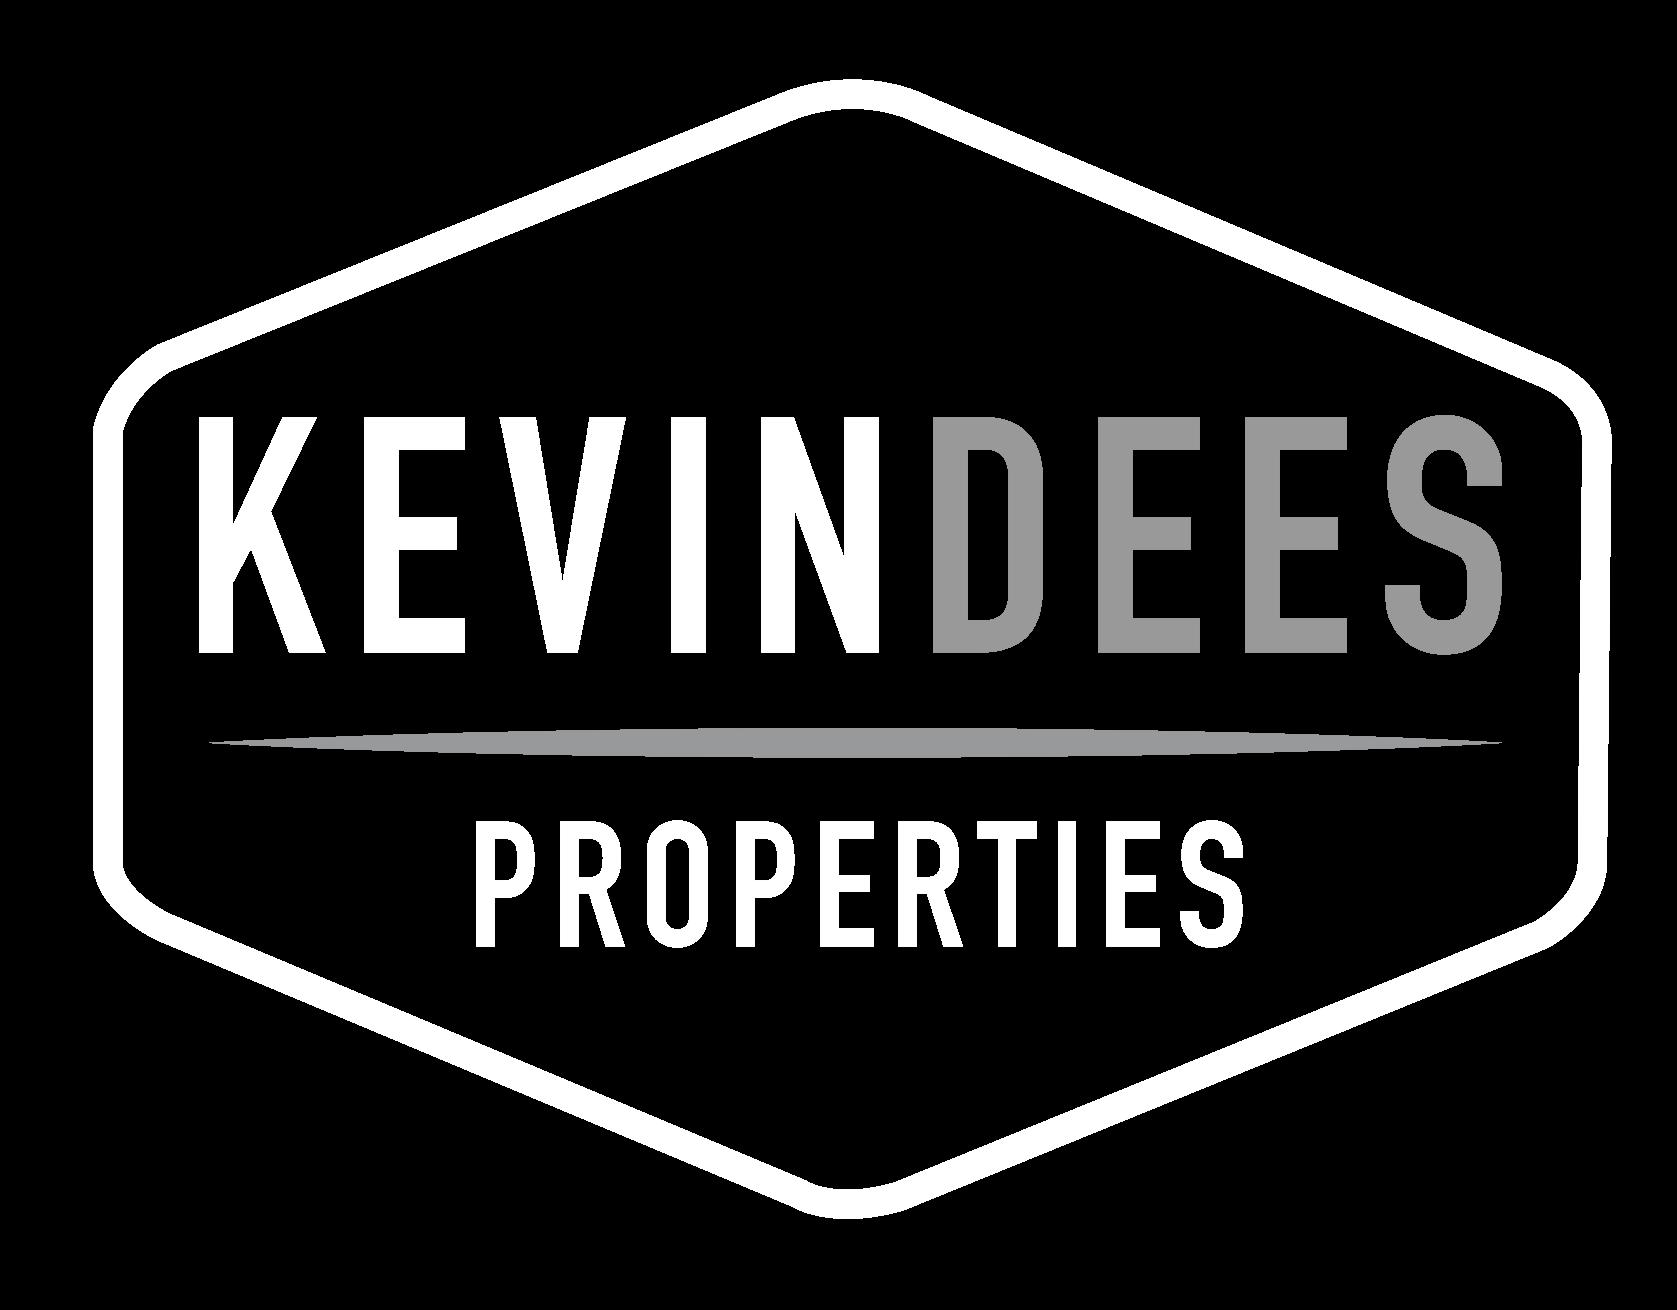 kevin logo 4 up-03dfsdfsdfsdfsfsf.png